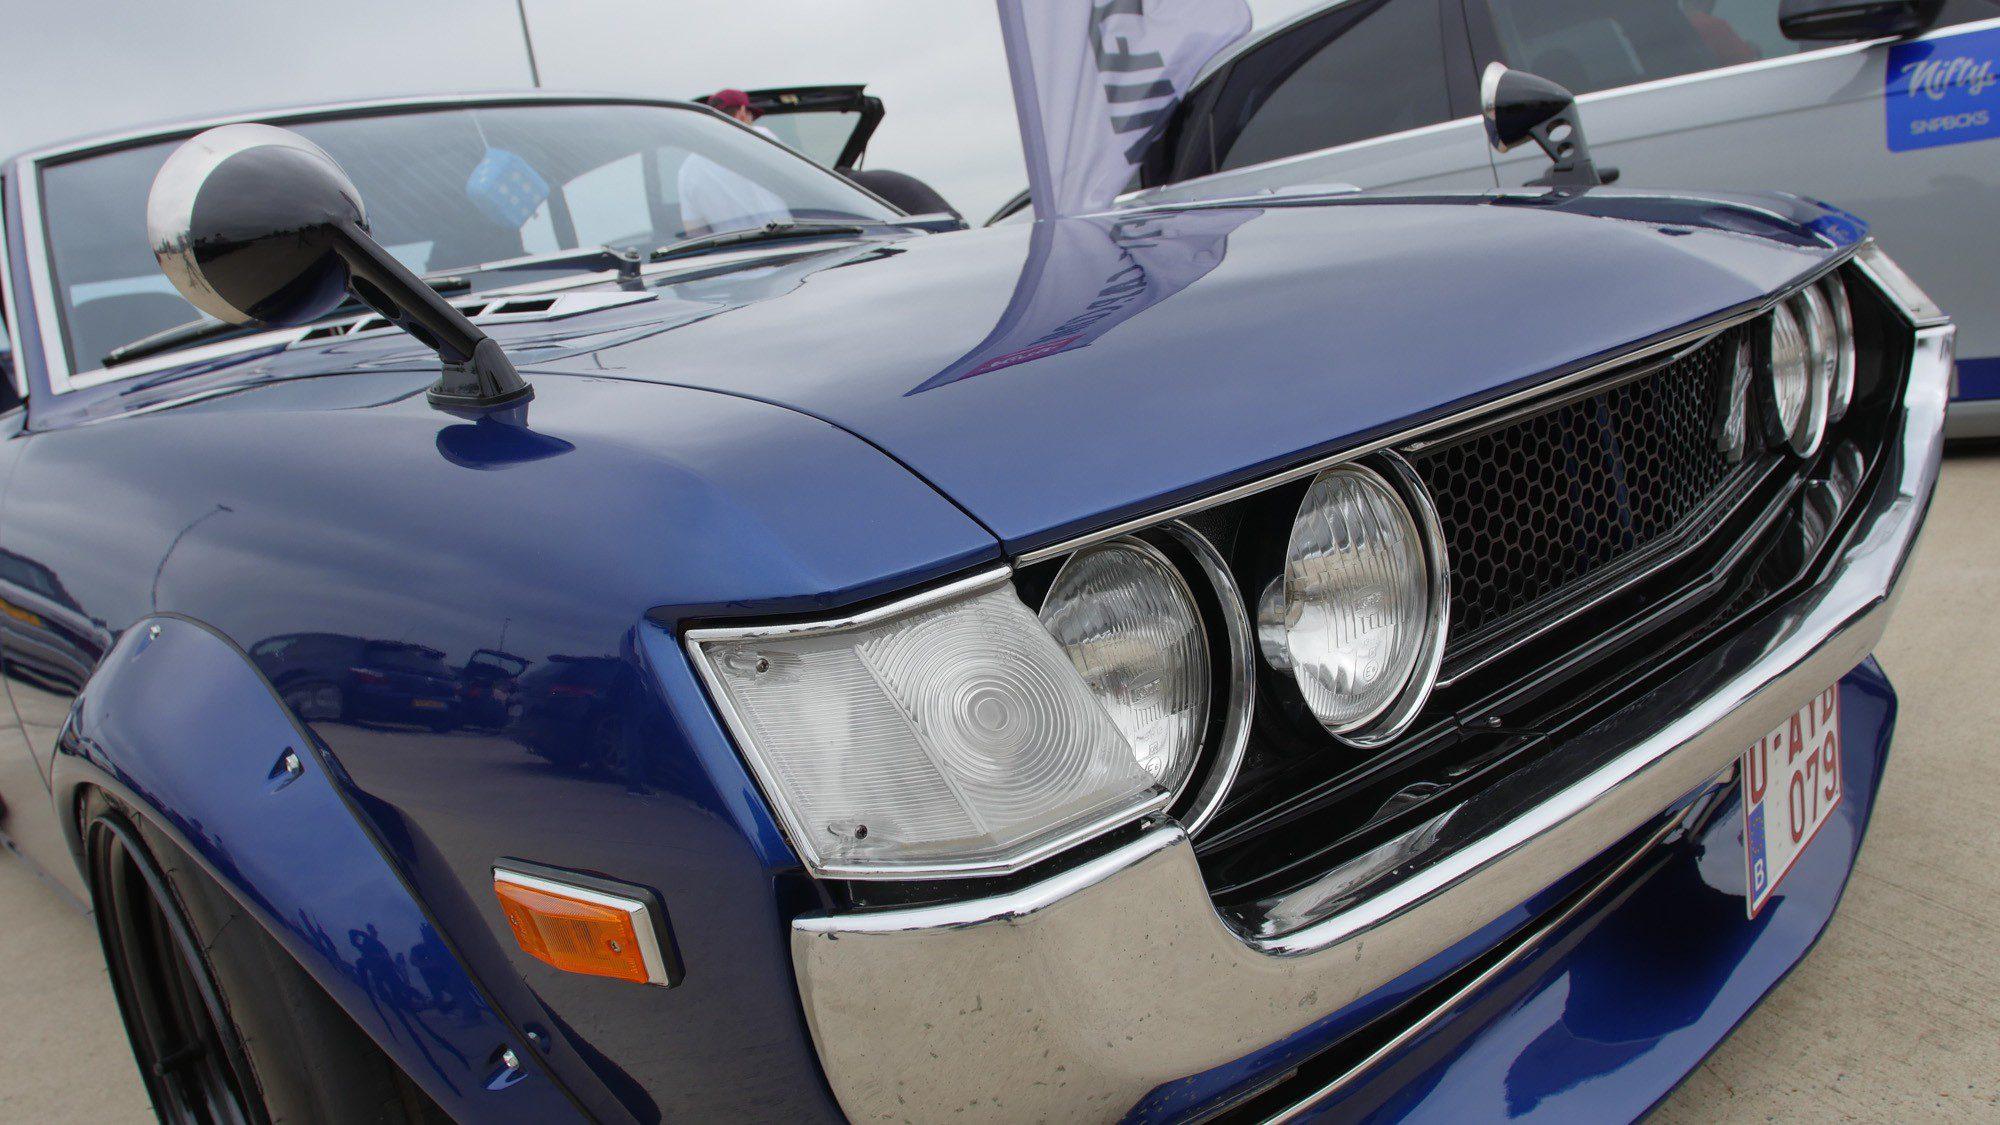 Frontdetails der Toyota Celica